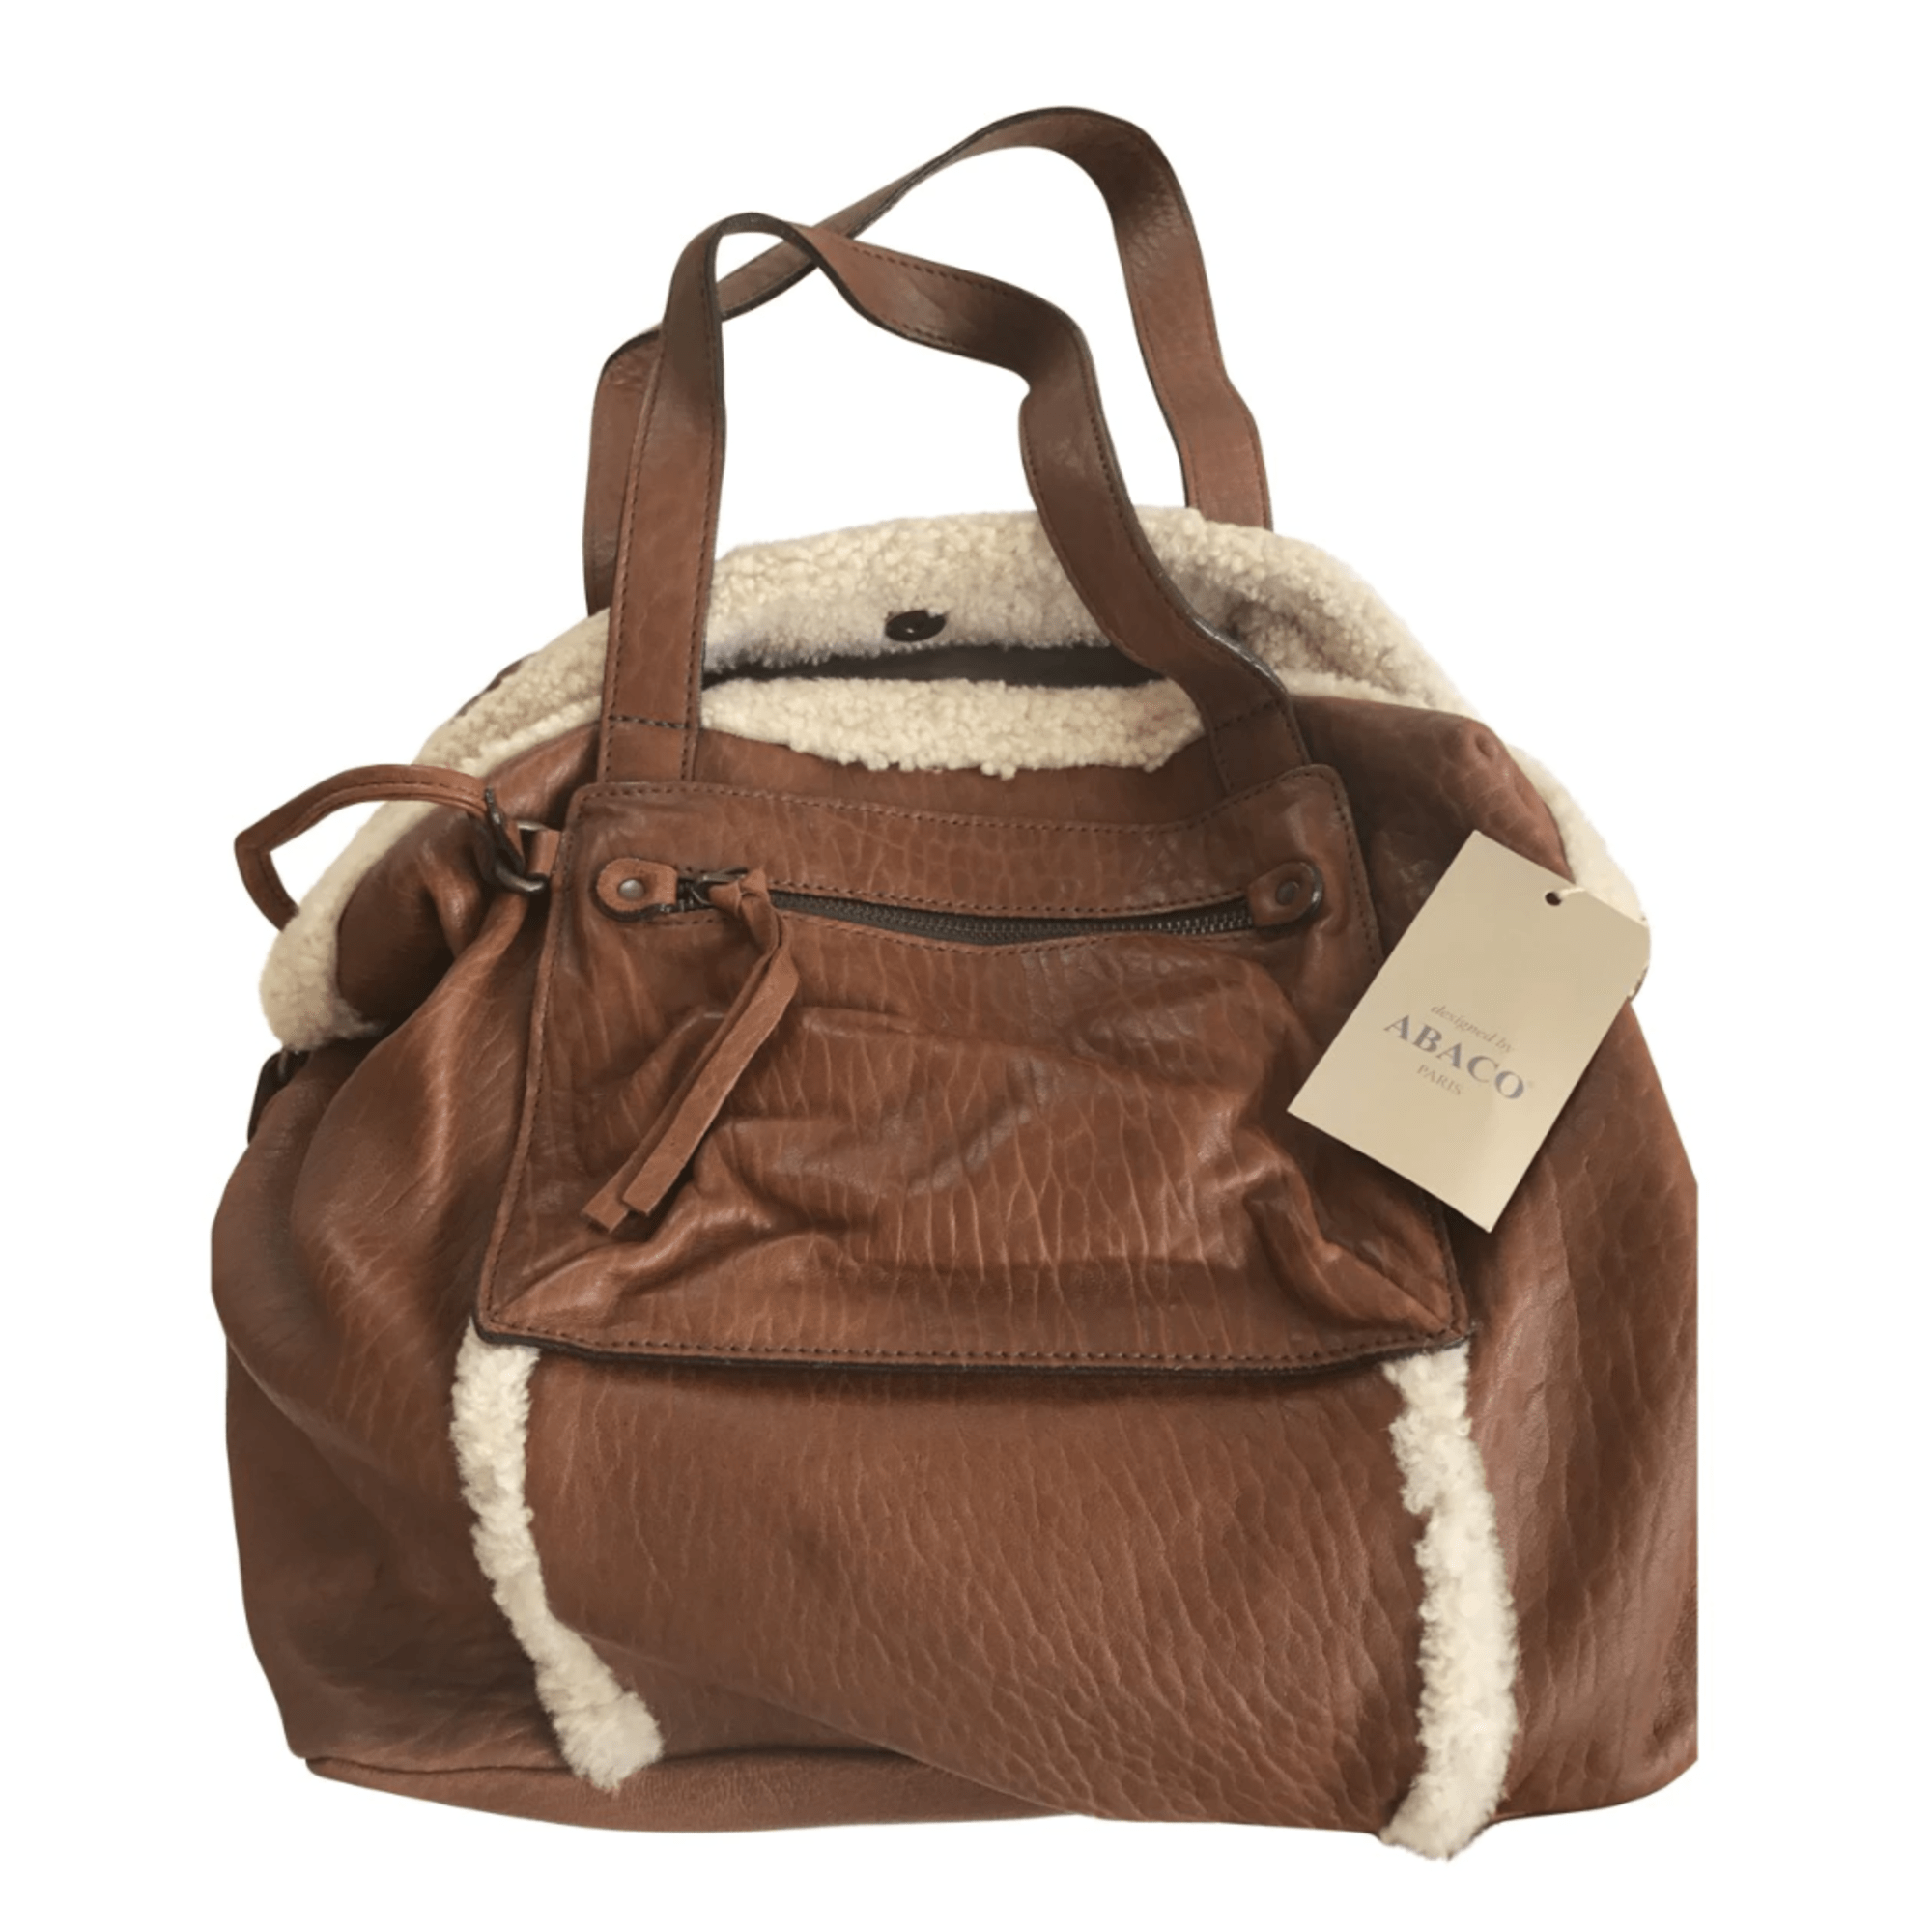 how to get pen off leather handbag